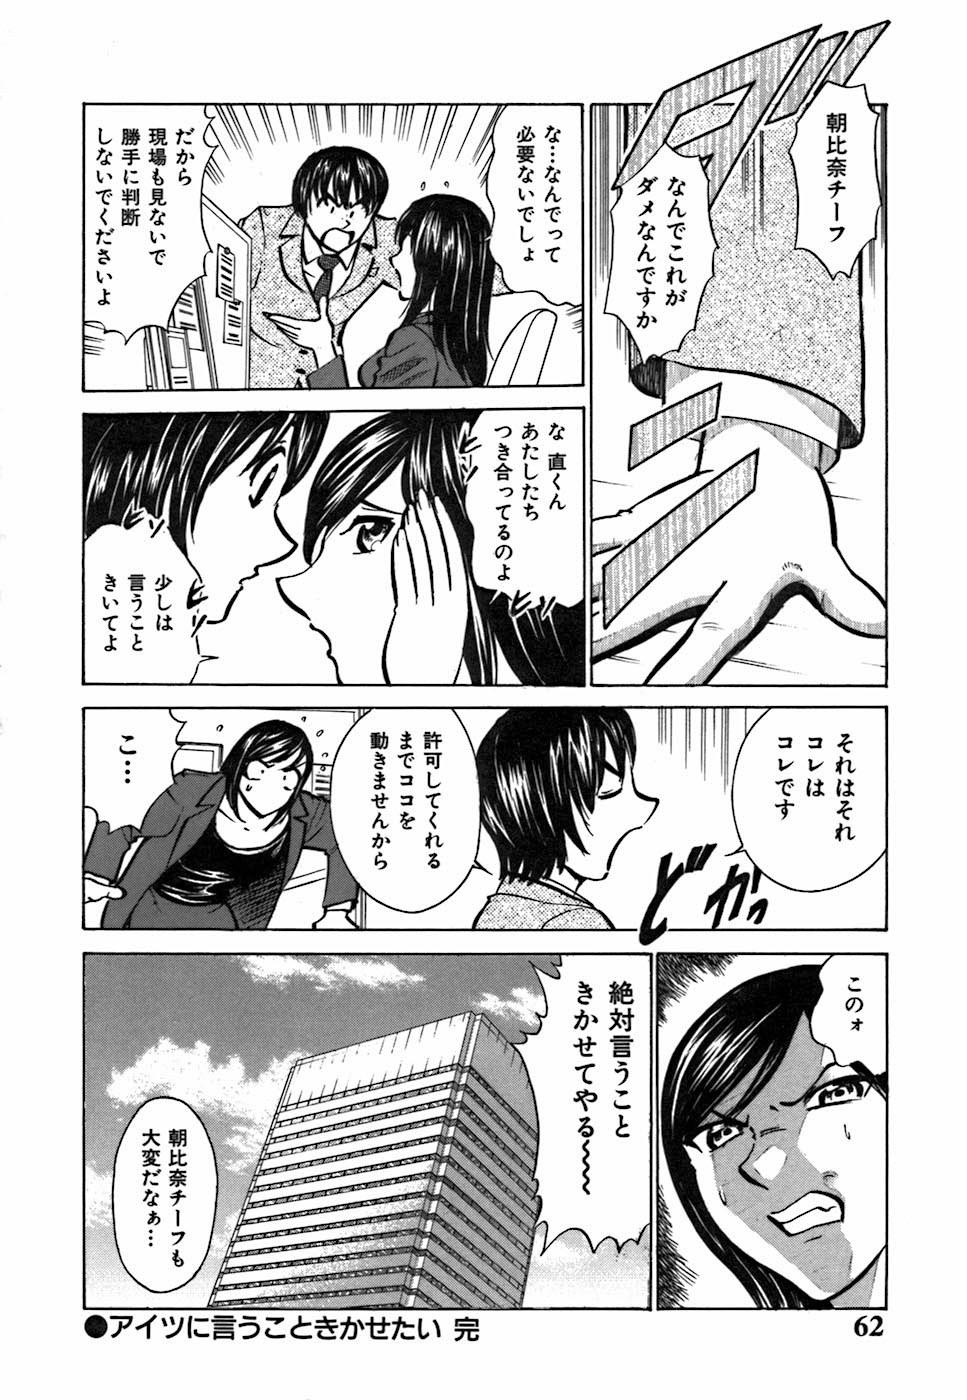 Kimi ga Nozomu Katachi | Appearance for which you hope 61